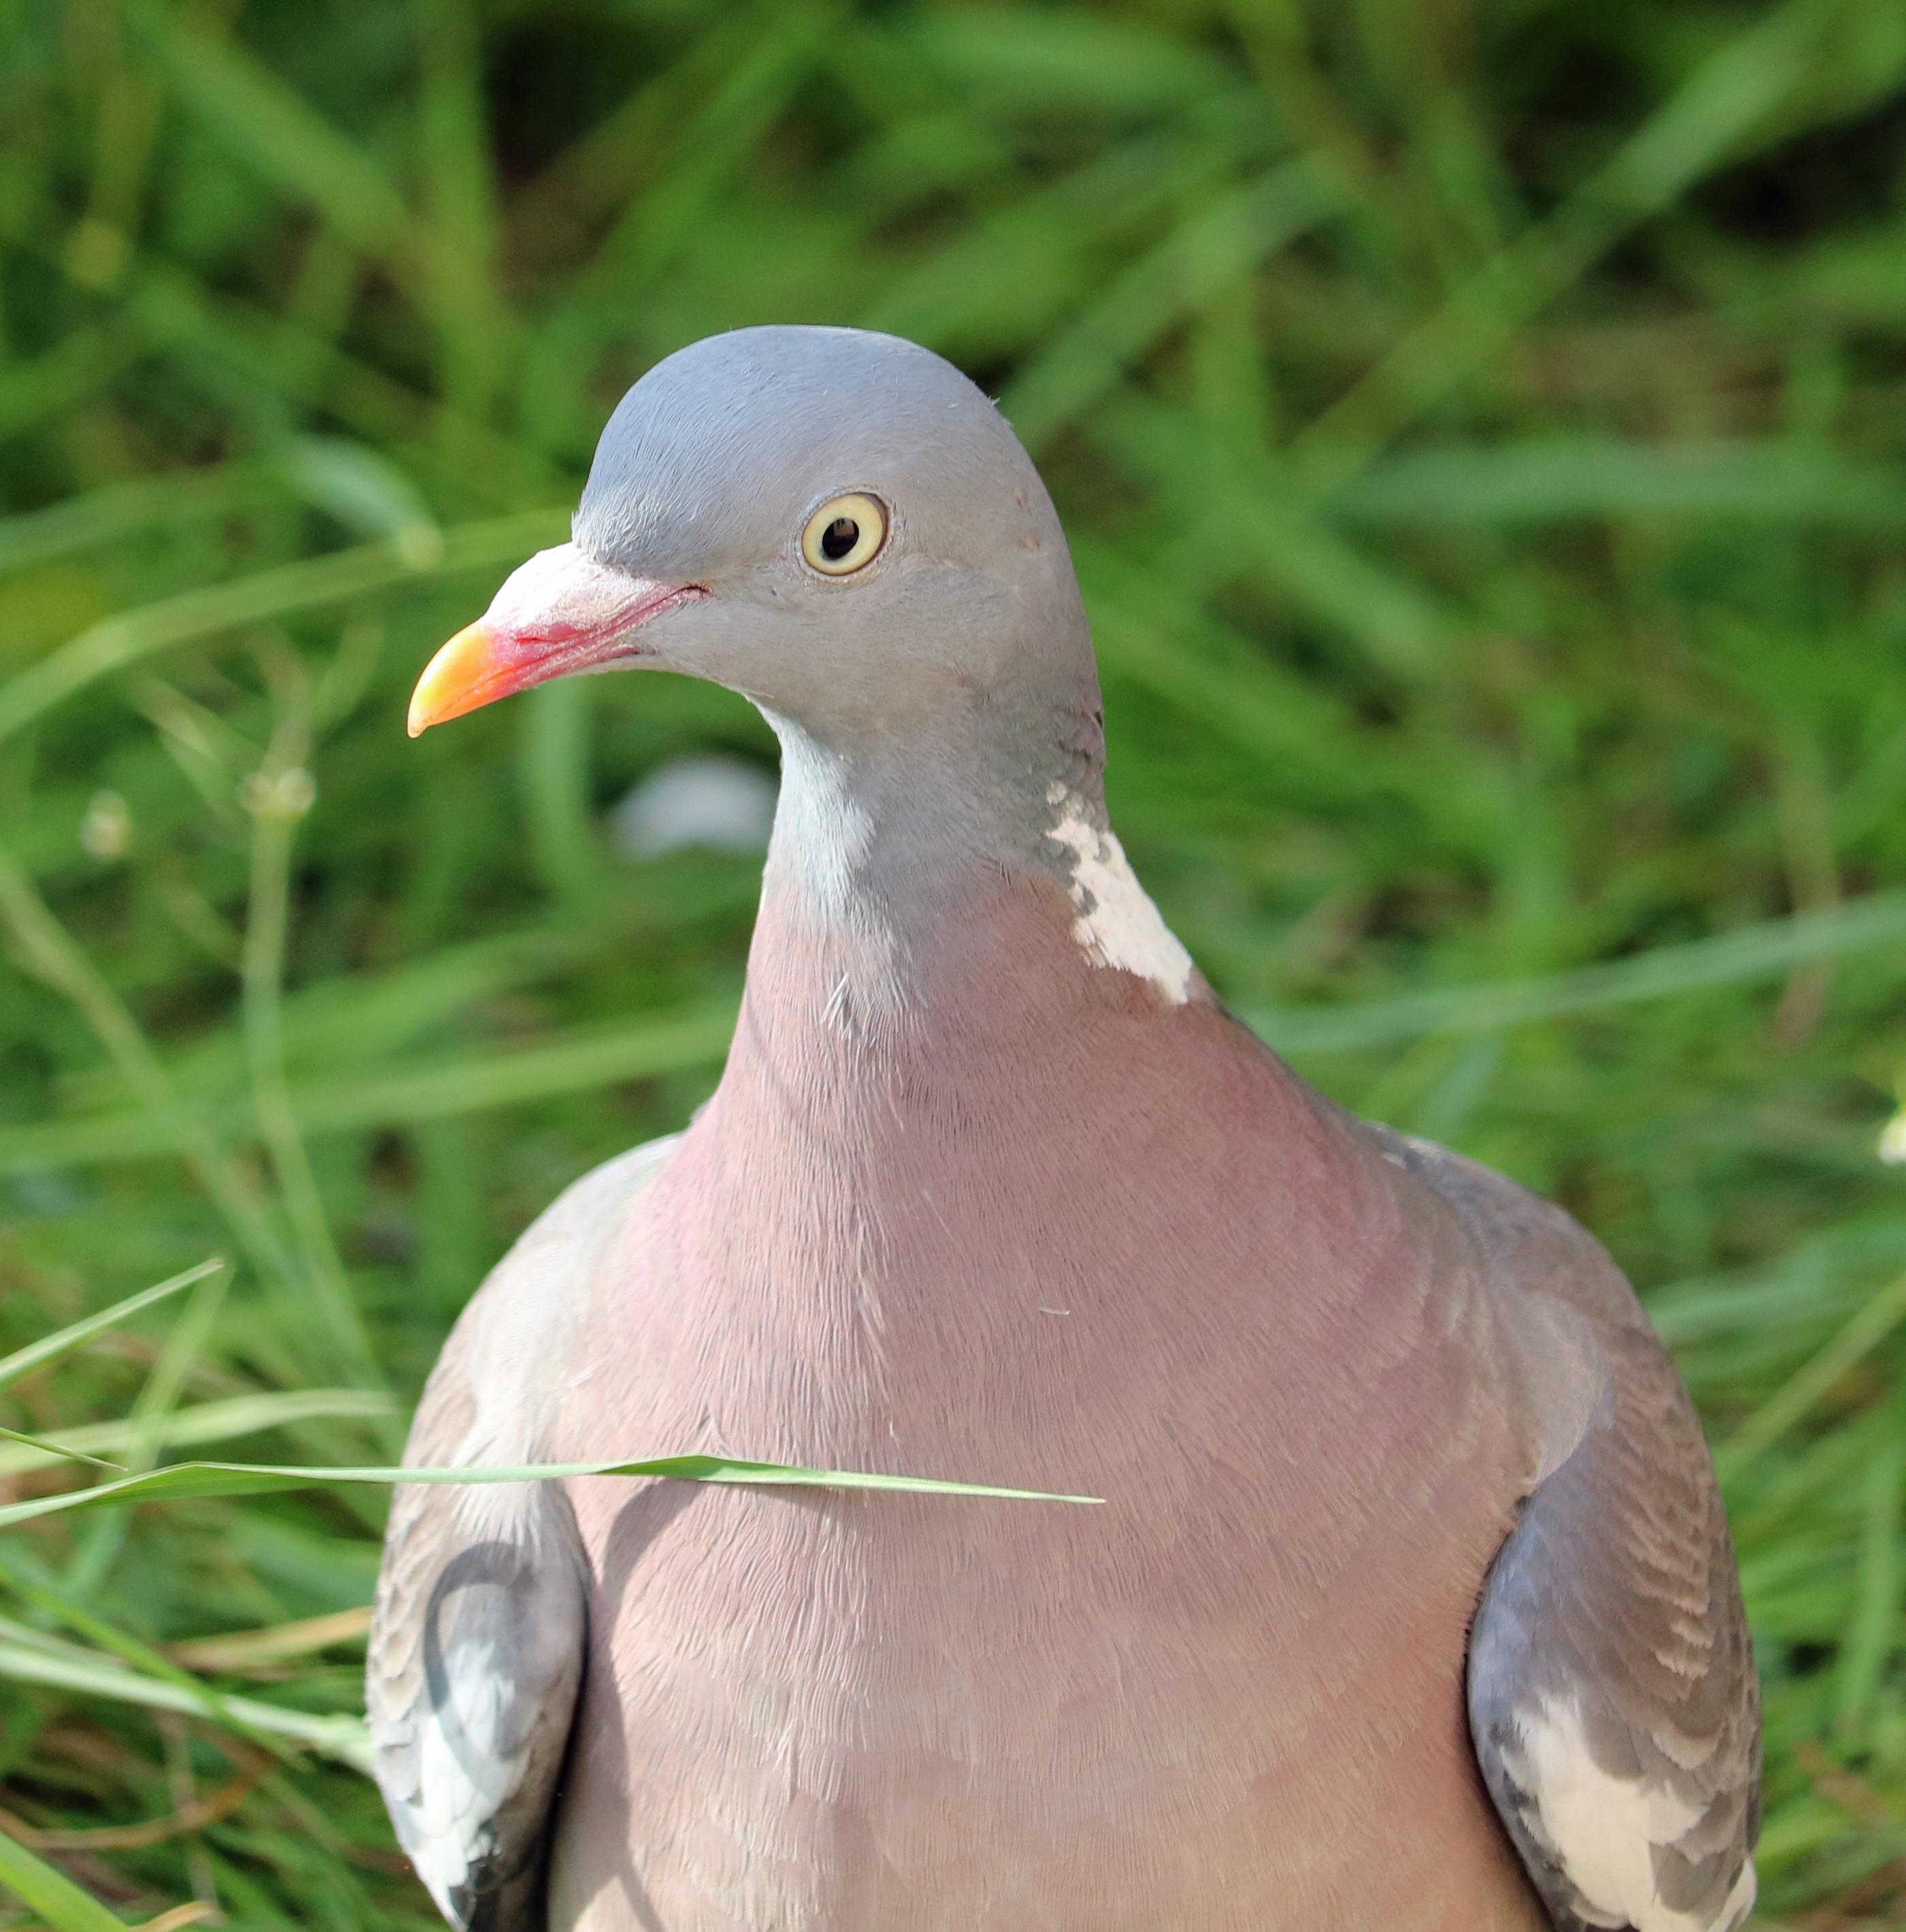 Free images bird seabird wildlife beak close fauna pigeon bird seabird wildlife beak close fauna pigeon head vertebrate pigeons and doves stock dove buycottarizona